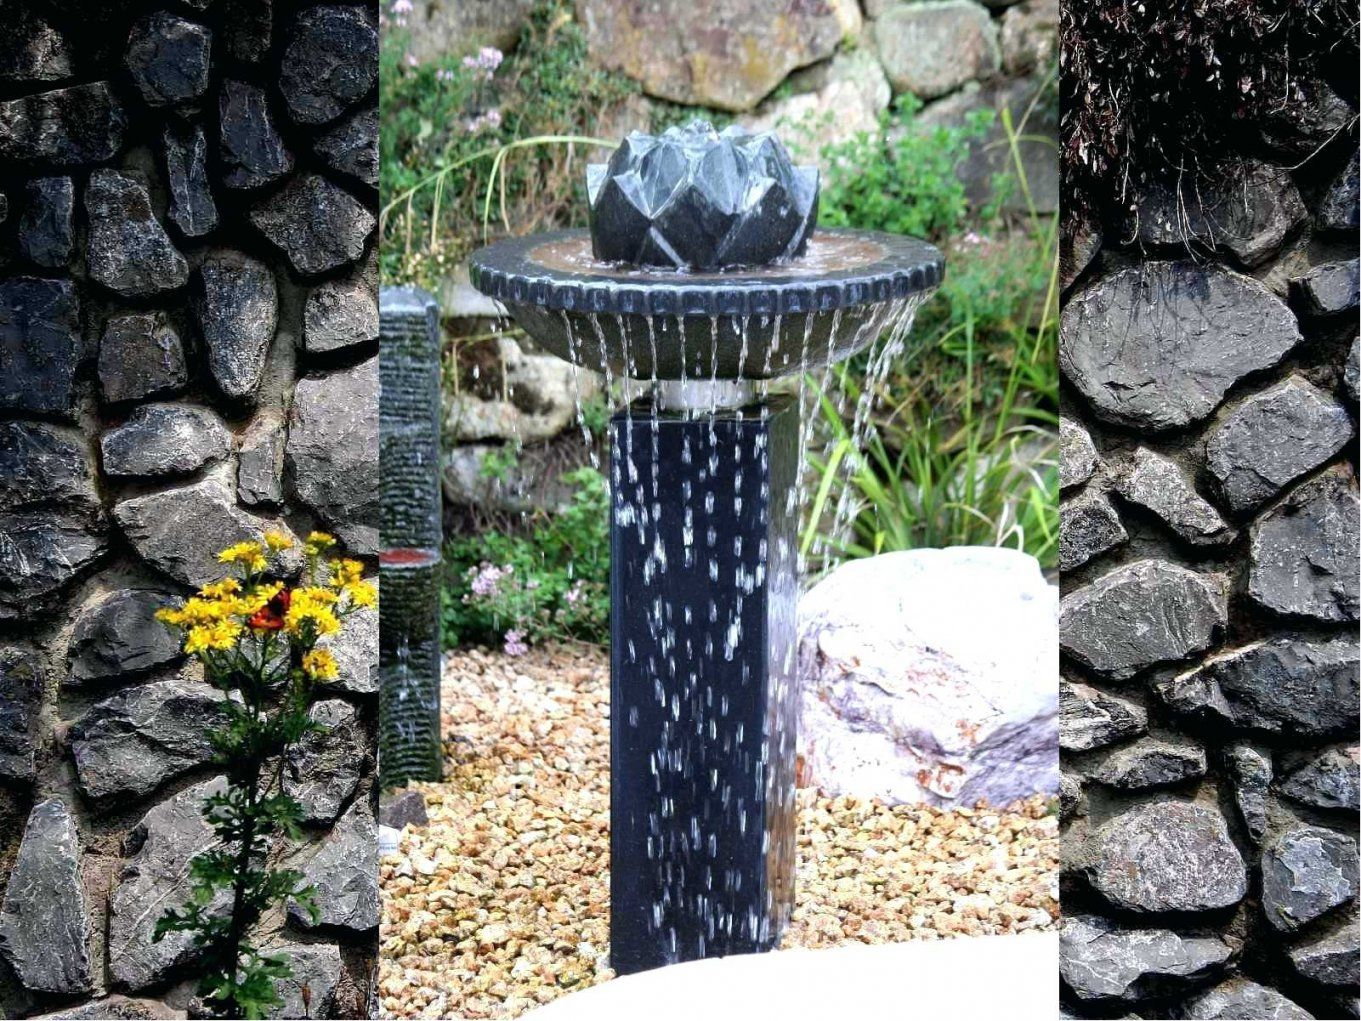 Gartenbrunnen Selber Bauen Stein A Brunnen Wasserfall Selbst von Wasserfall Brunnen Selber Bauen Photo